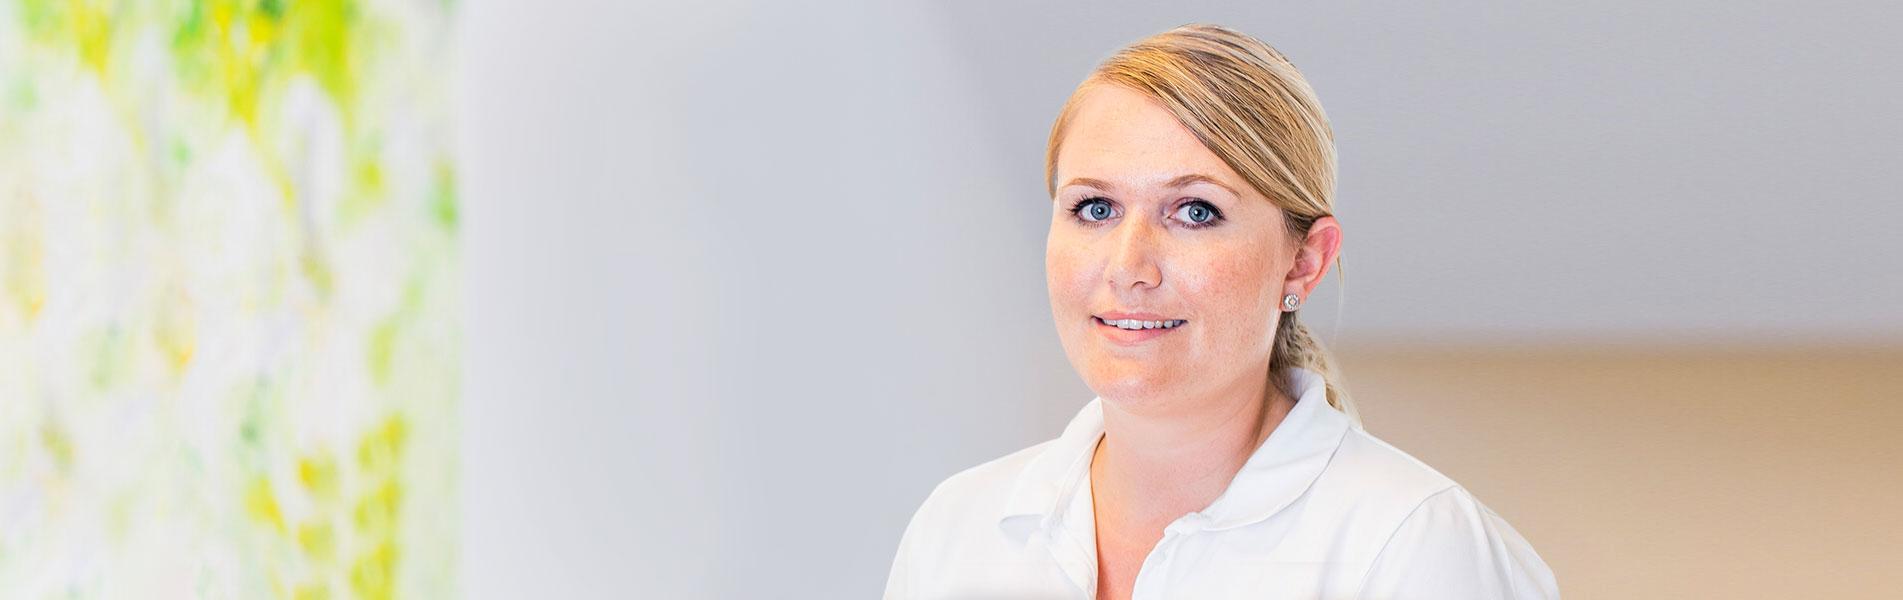 Christina Leunissen- Zahnarztpraxis Dr. Tolk + Team in Kreuzau bei Düren